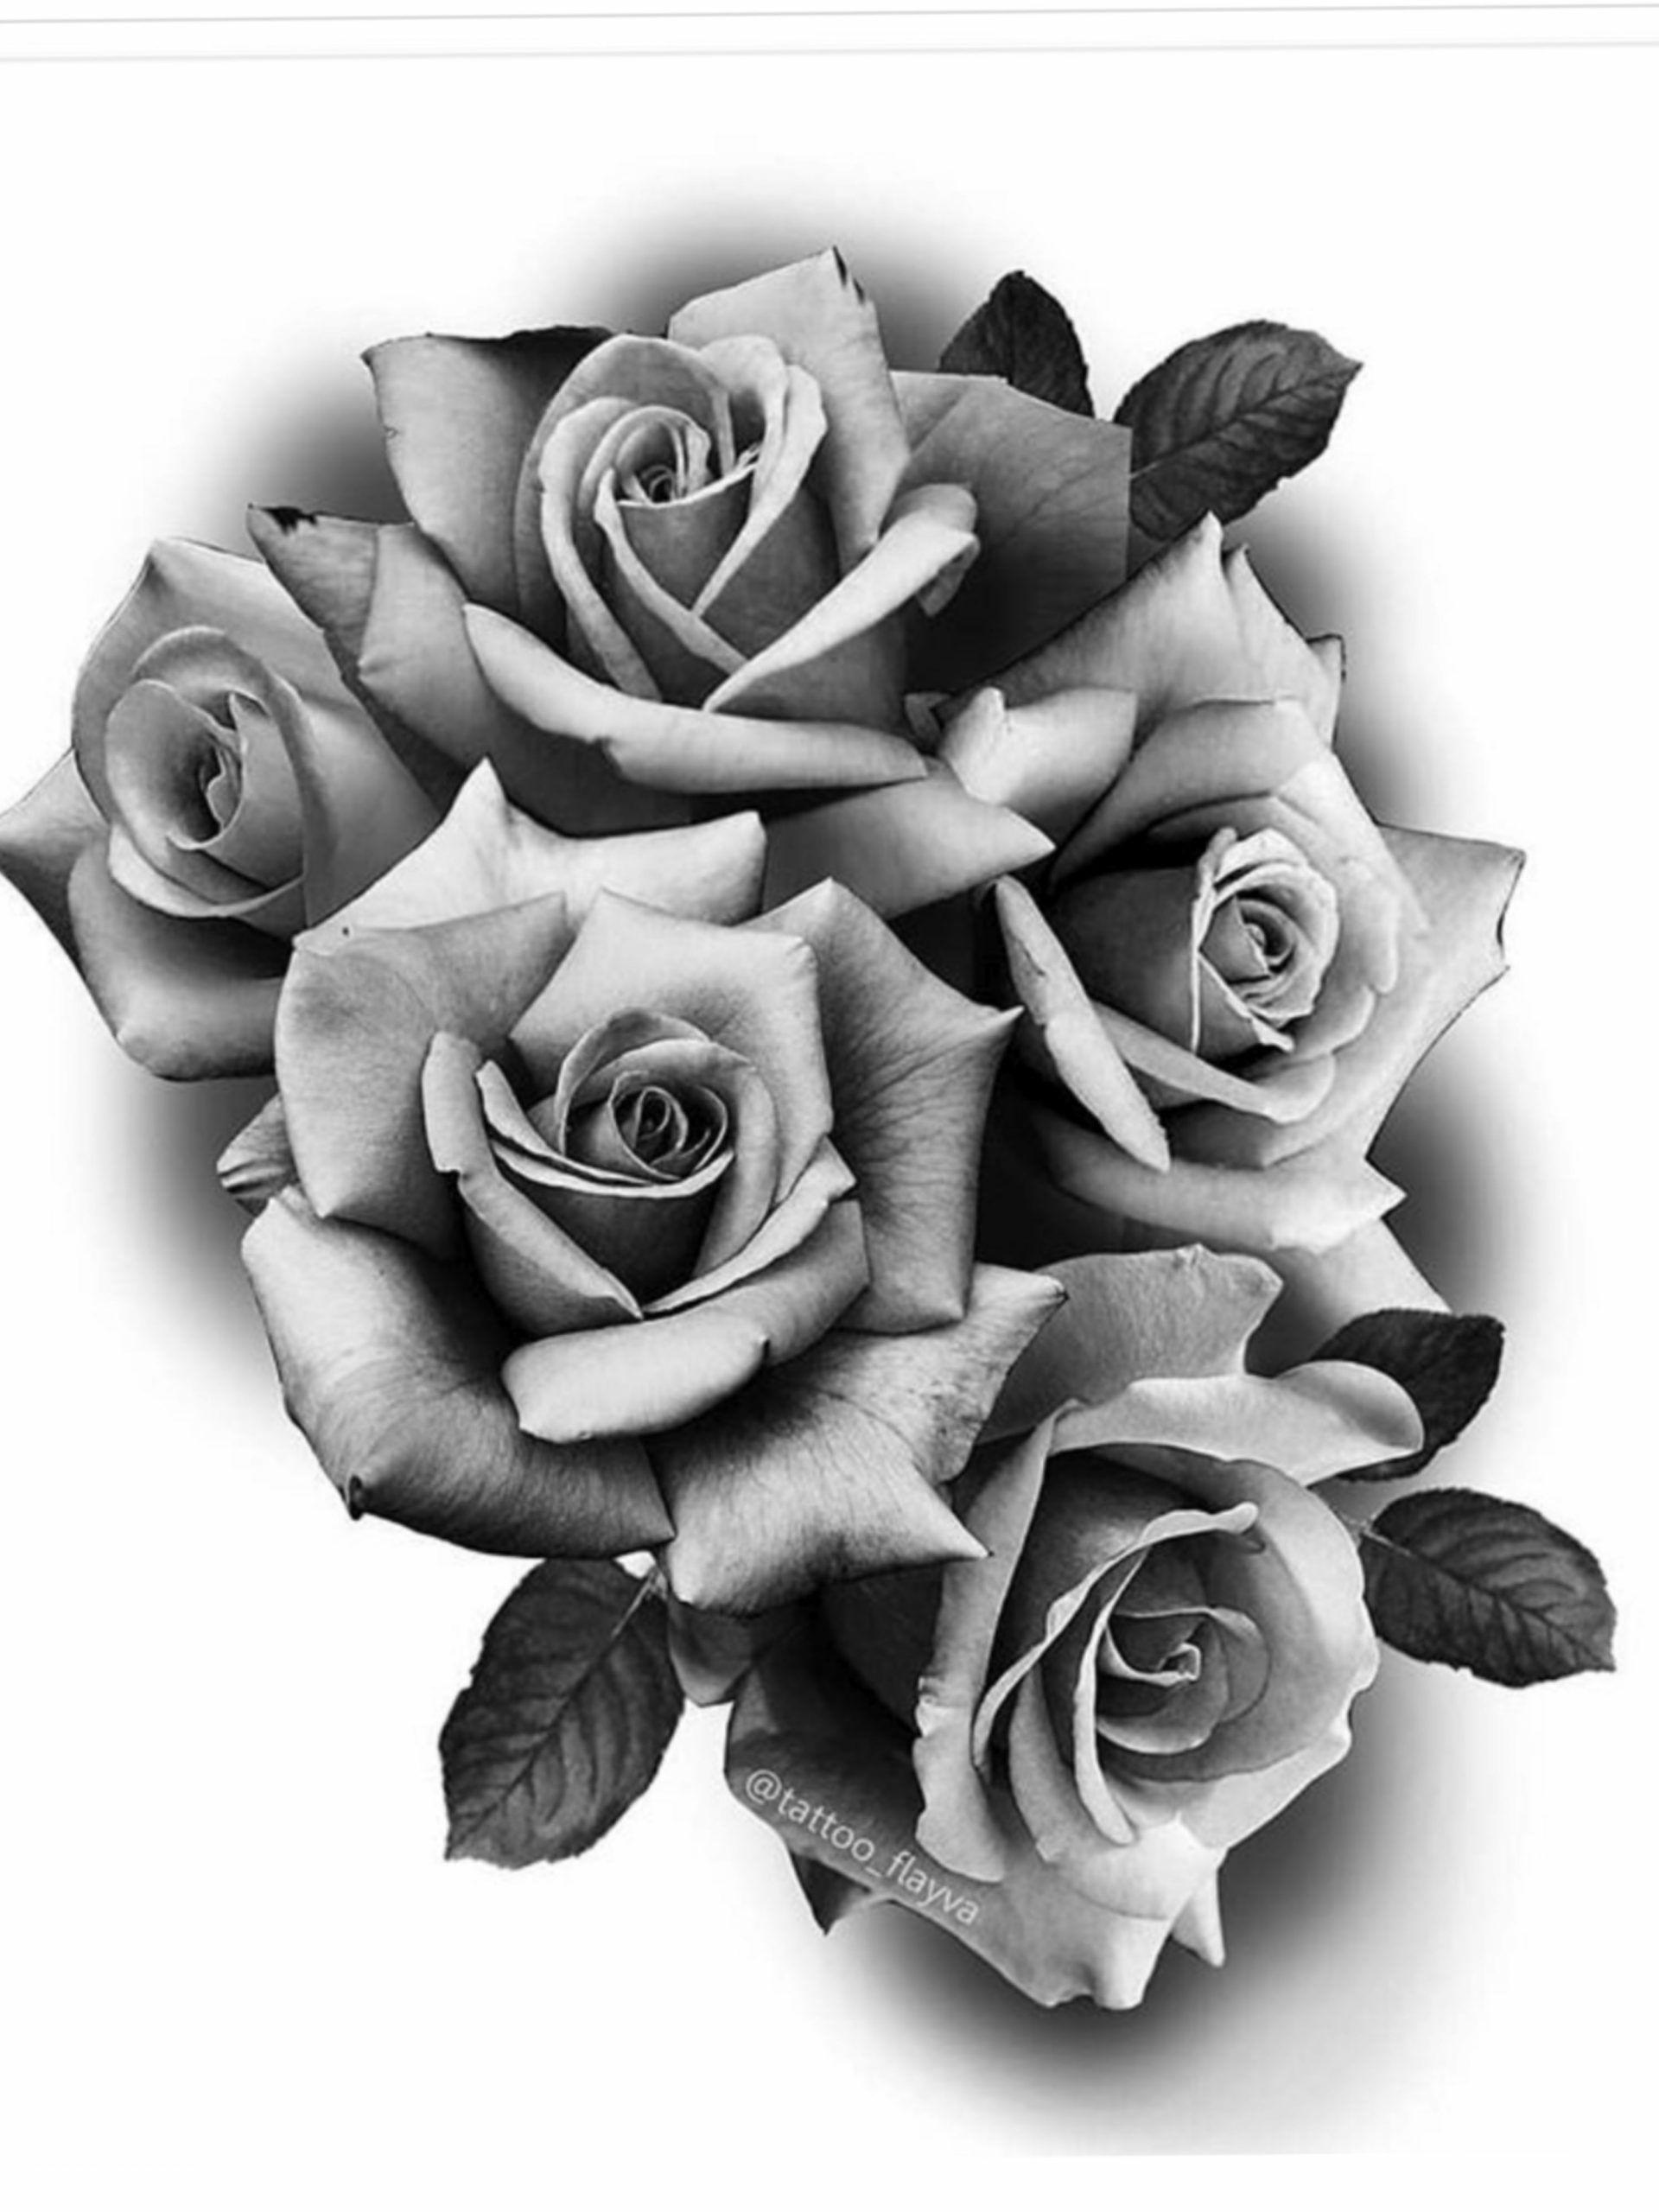 Tattoo roses templatesroses tattoo templates in 2020